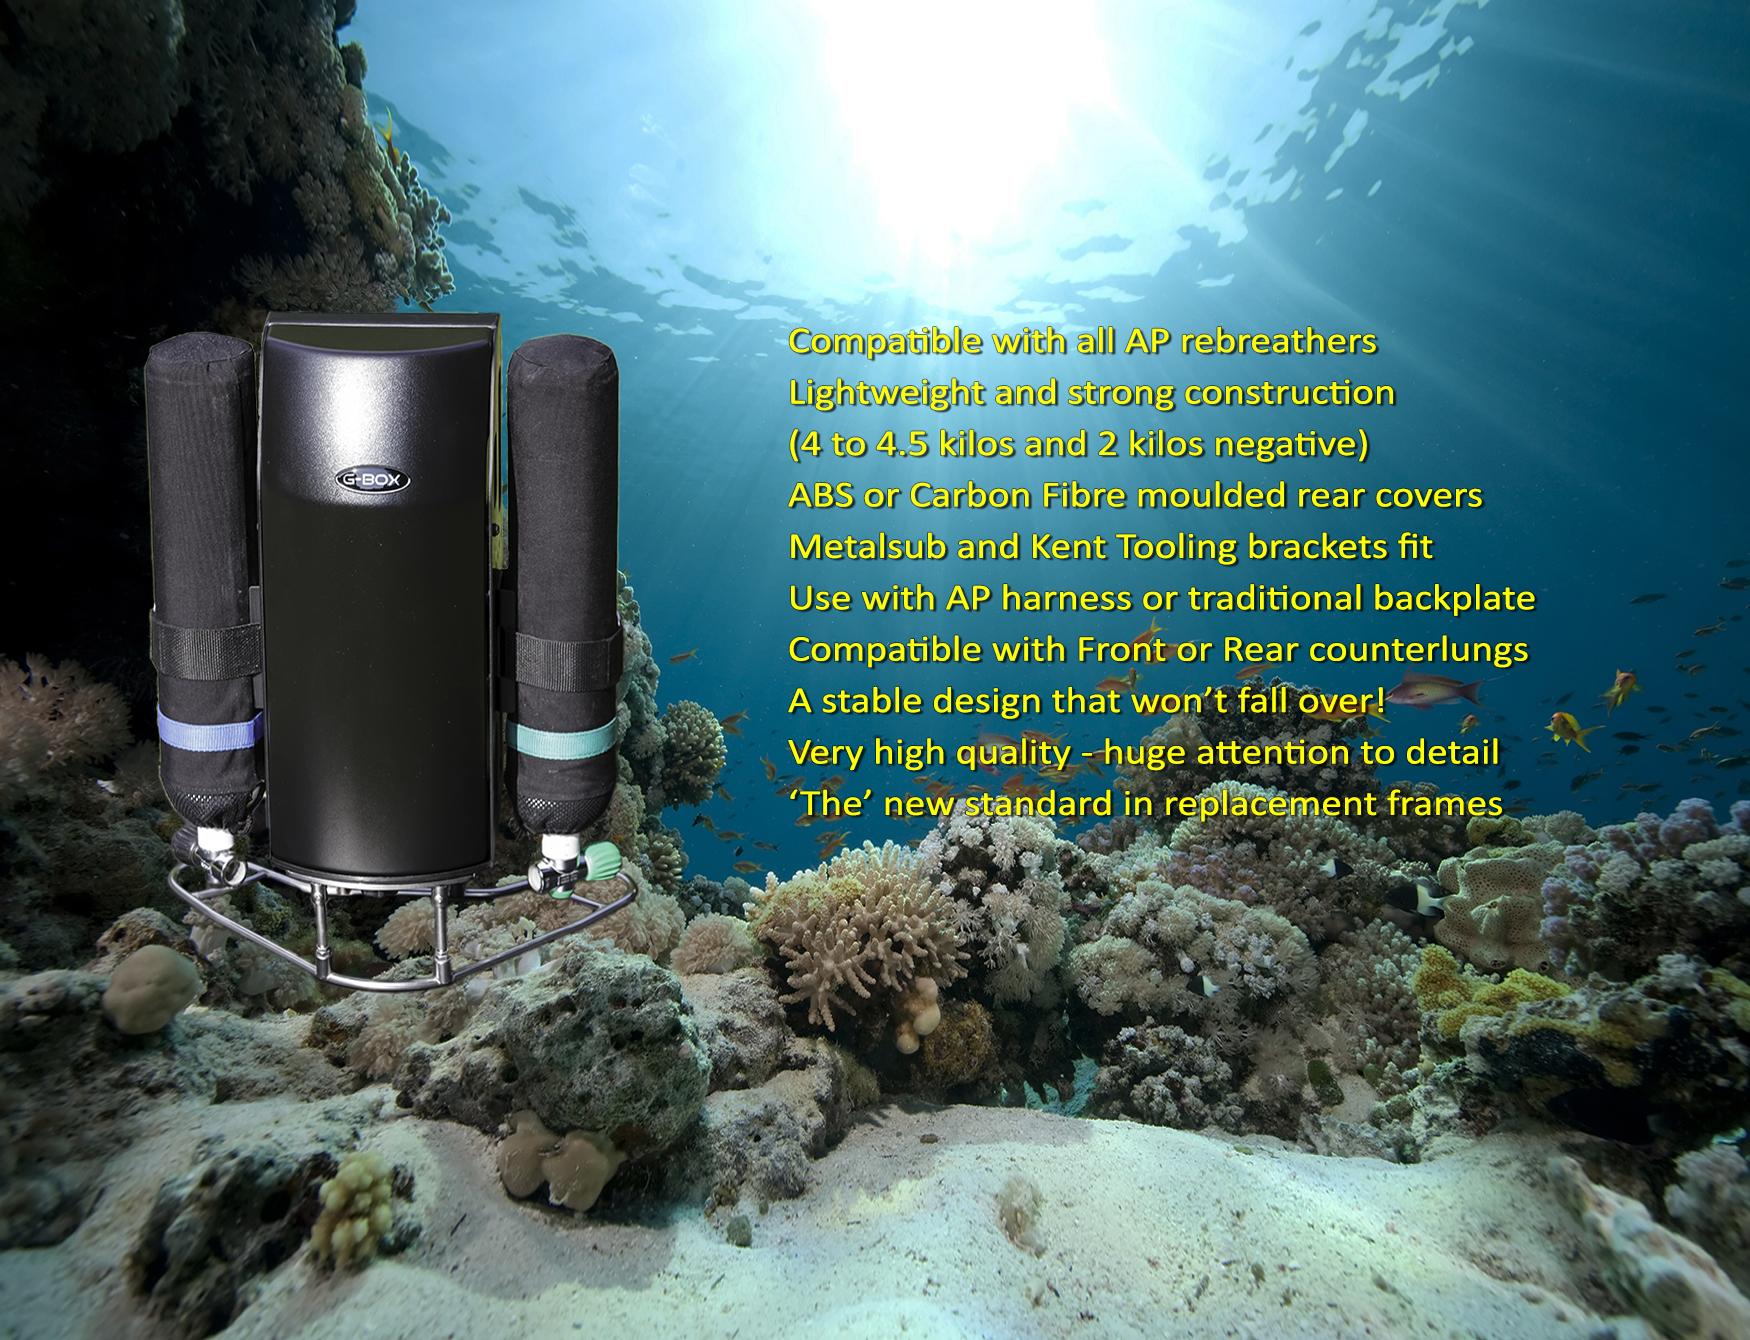 g-box on coralllllllllll.jpg